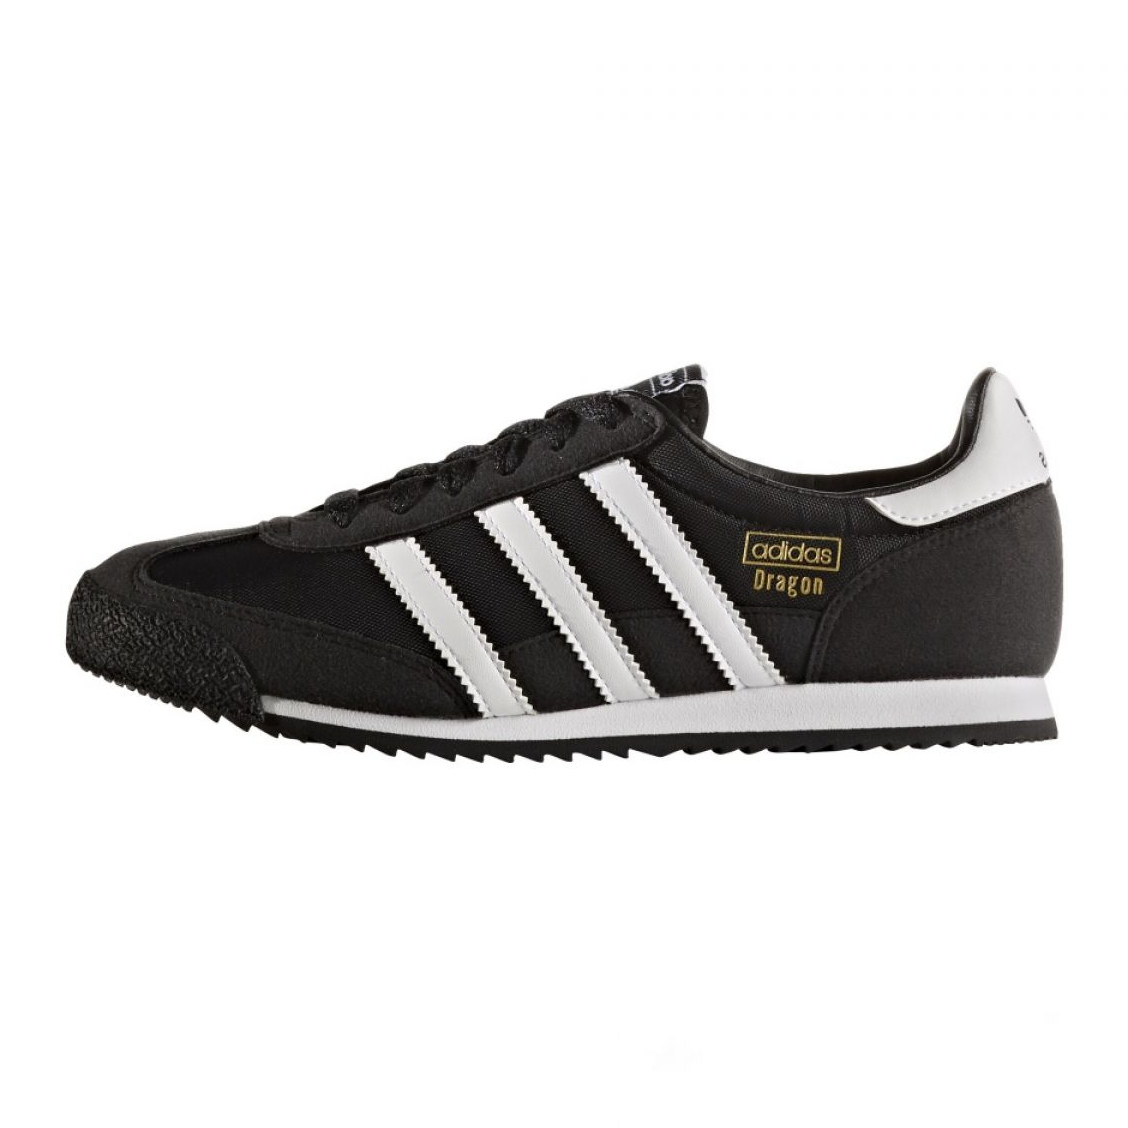 sneakers dragon adidas